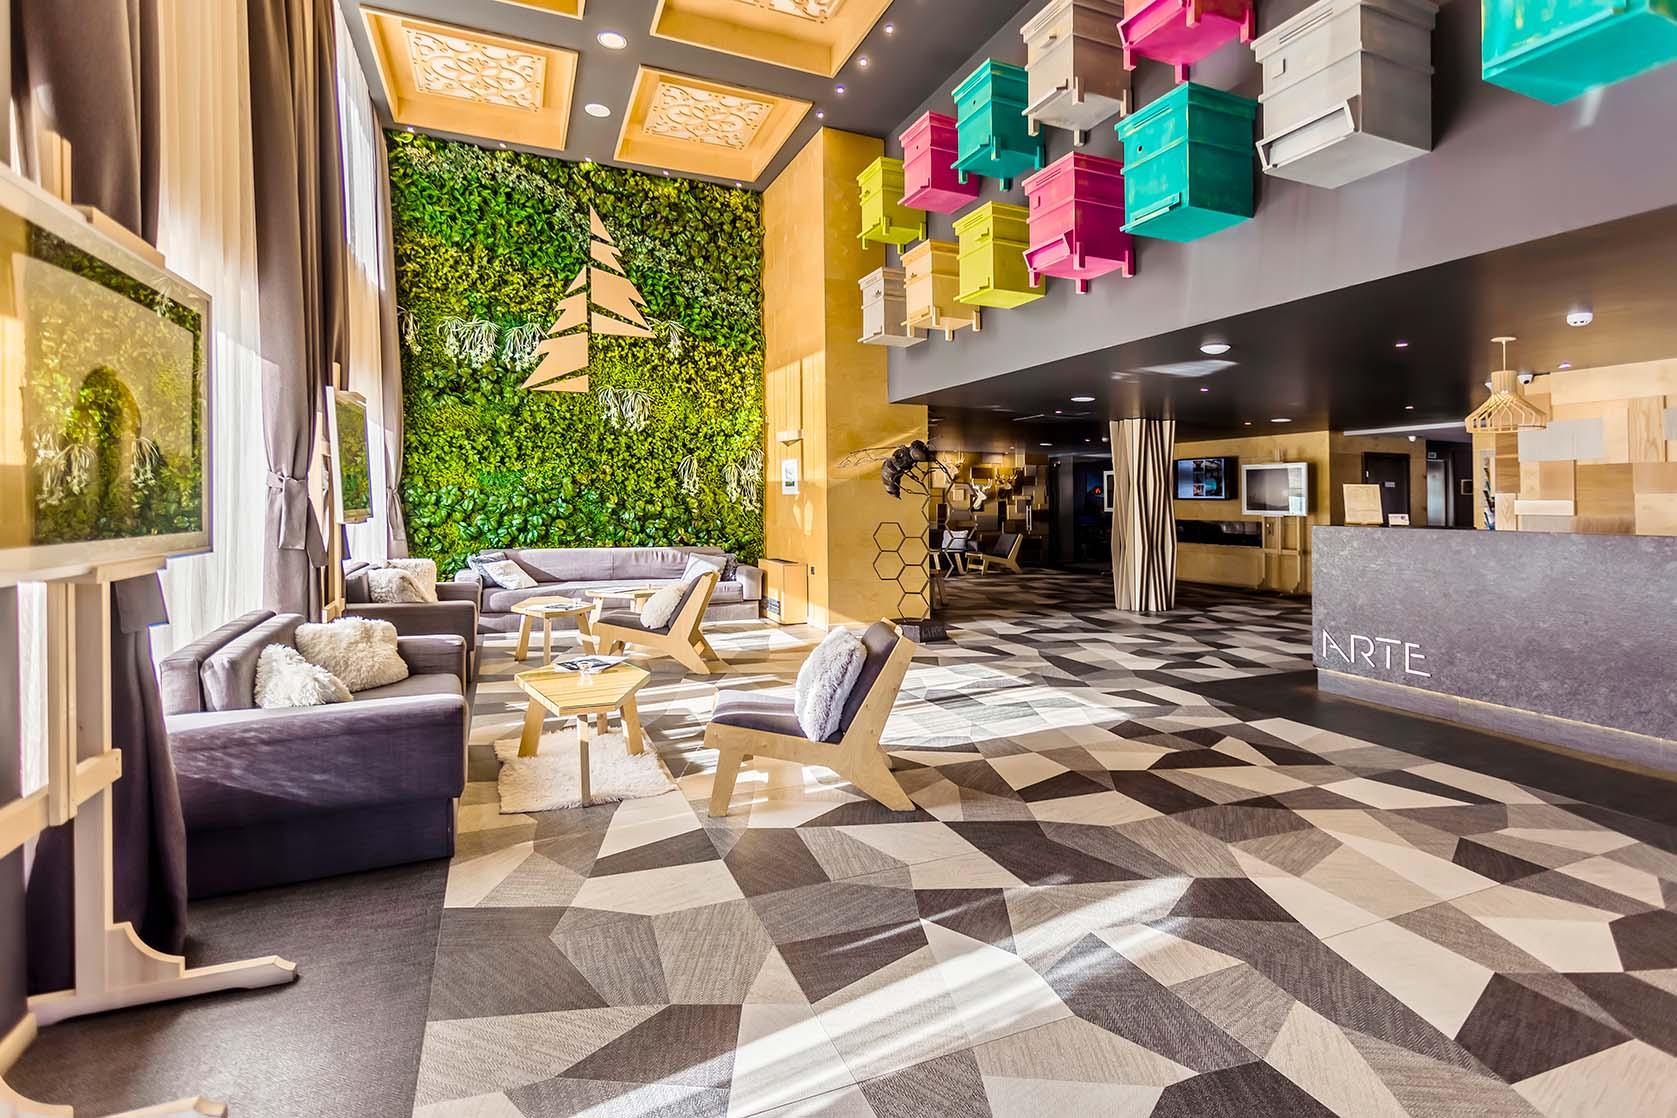 Arte Spa & Park Hotel 5*